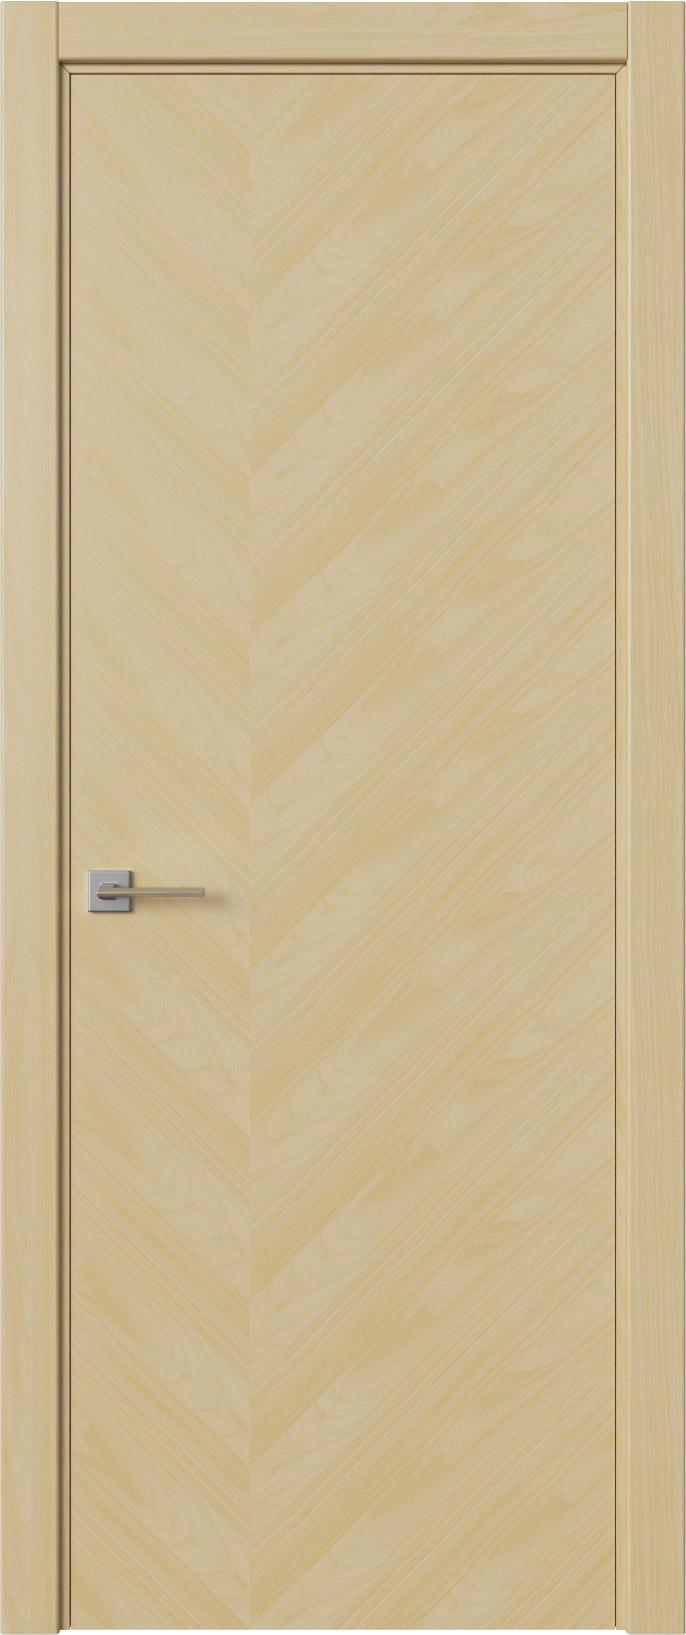 Tivoli Л-1 цвет - Дуб нордик Без стекла (ДГ)